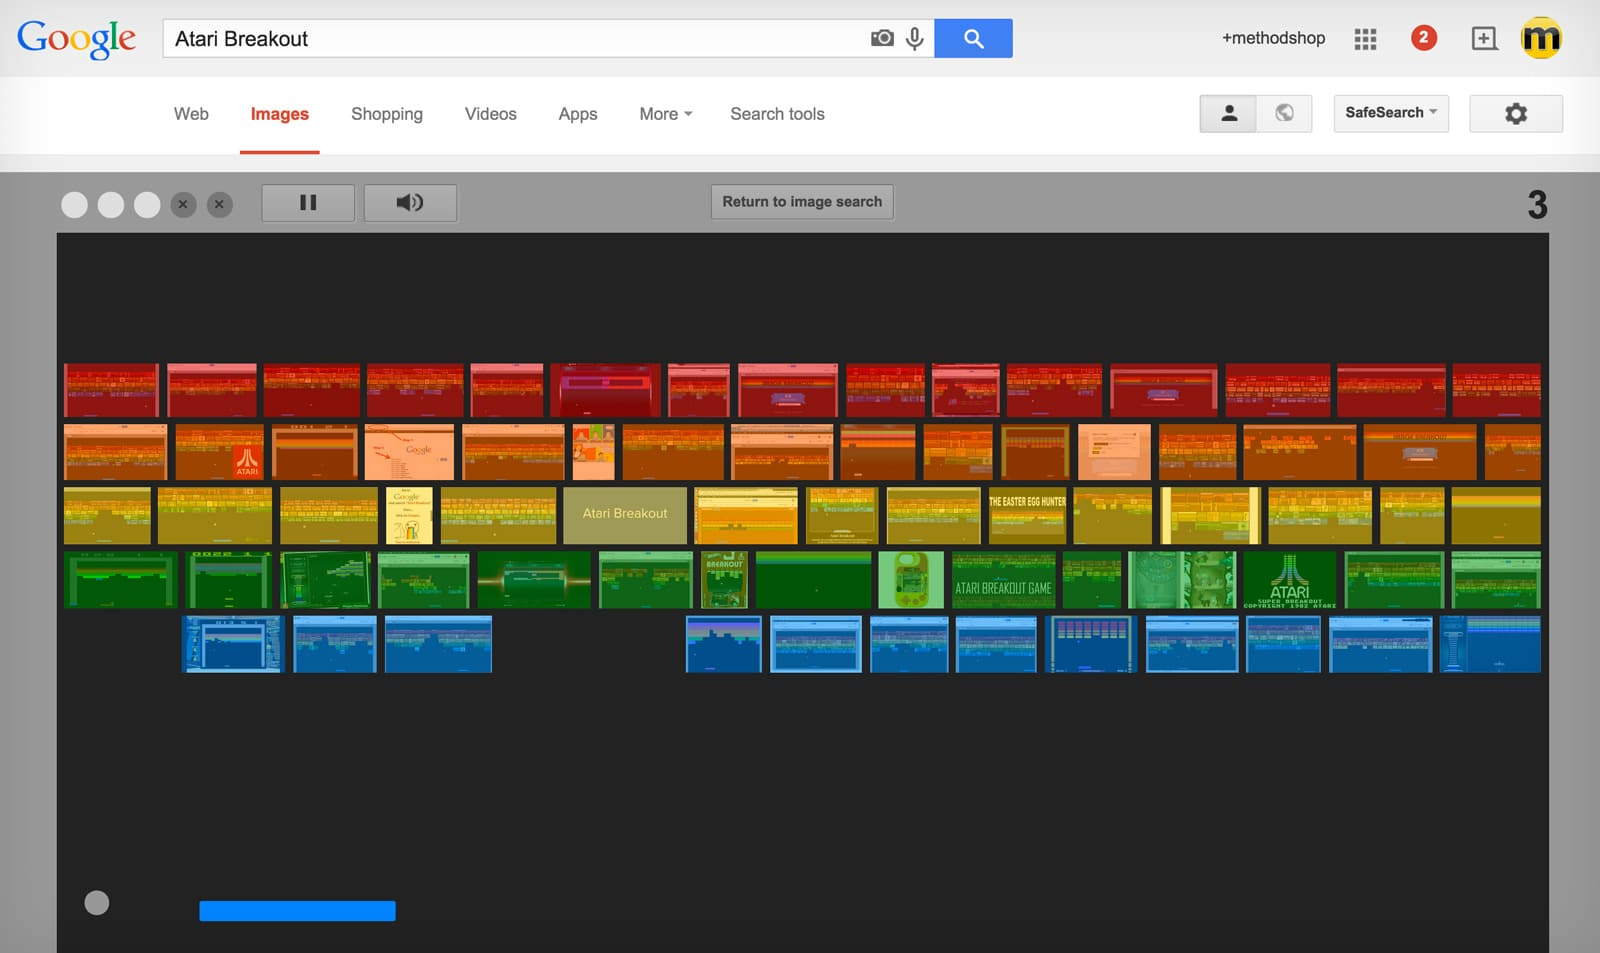 Celebrate Atari Breakout S 40th Anniversary With A Google